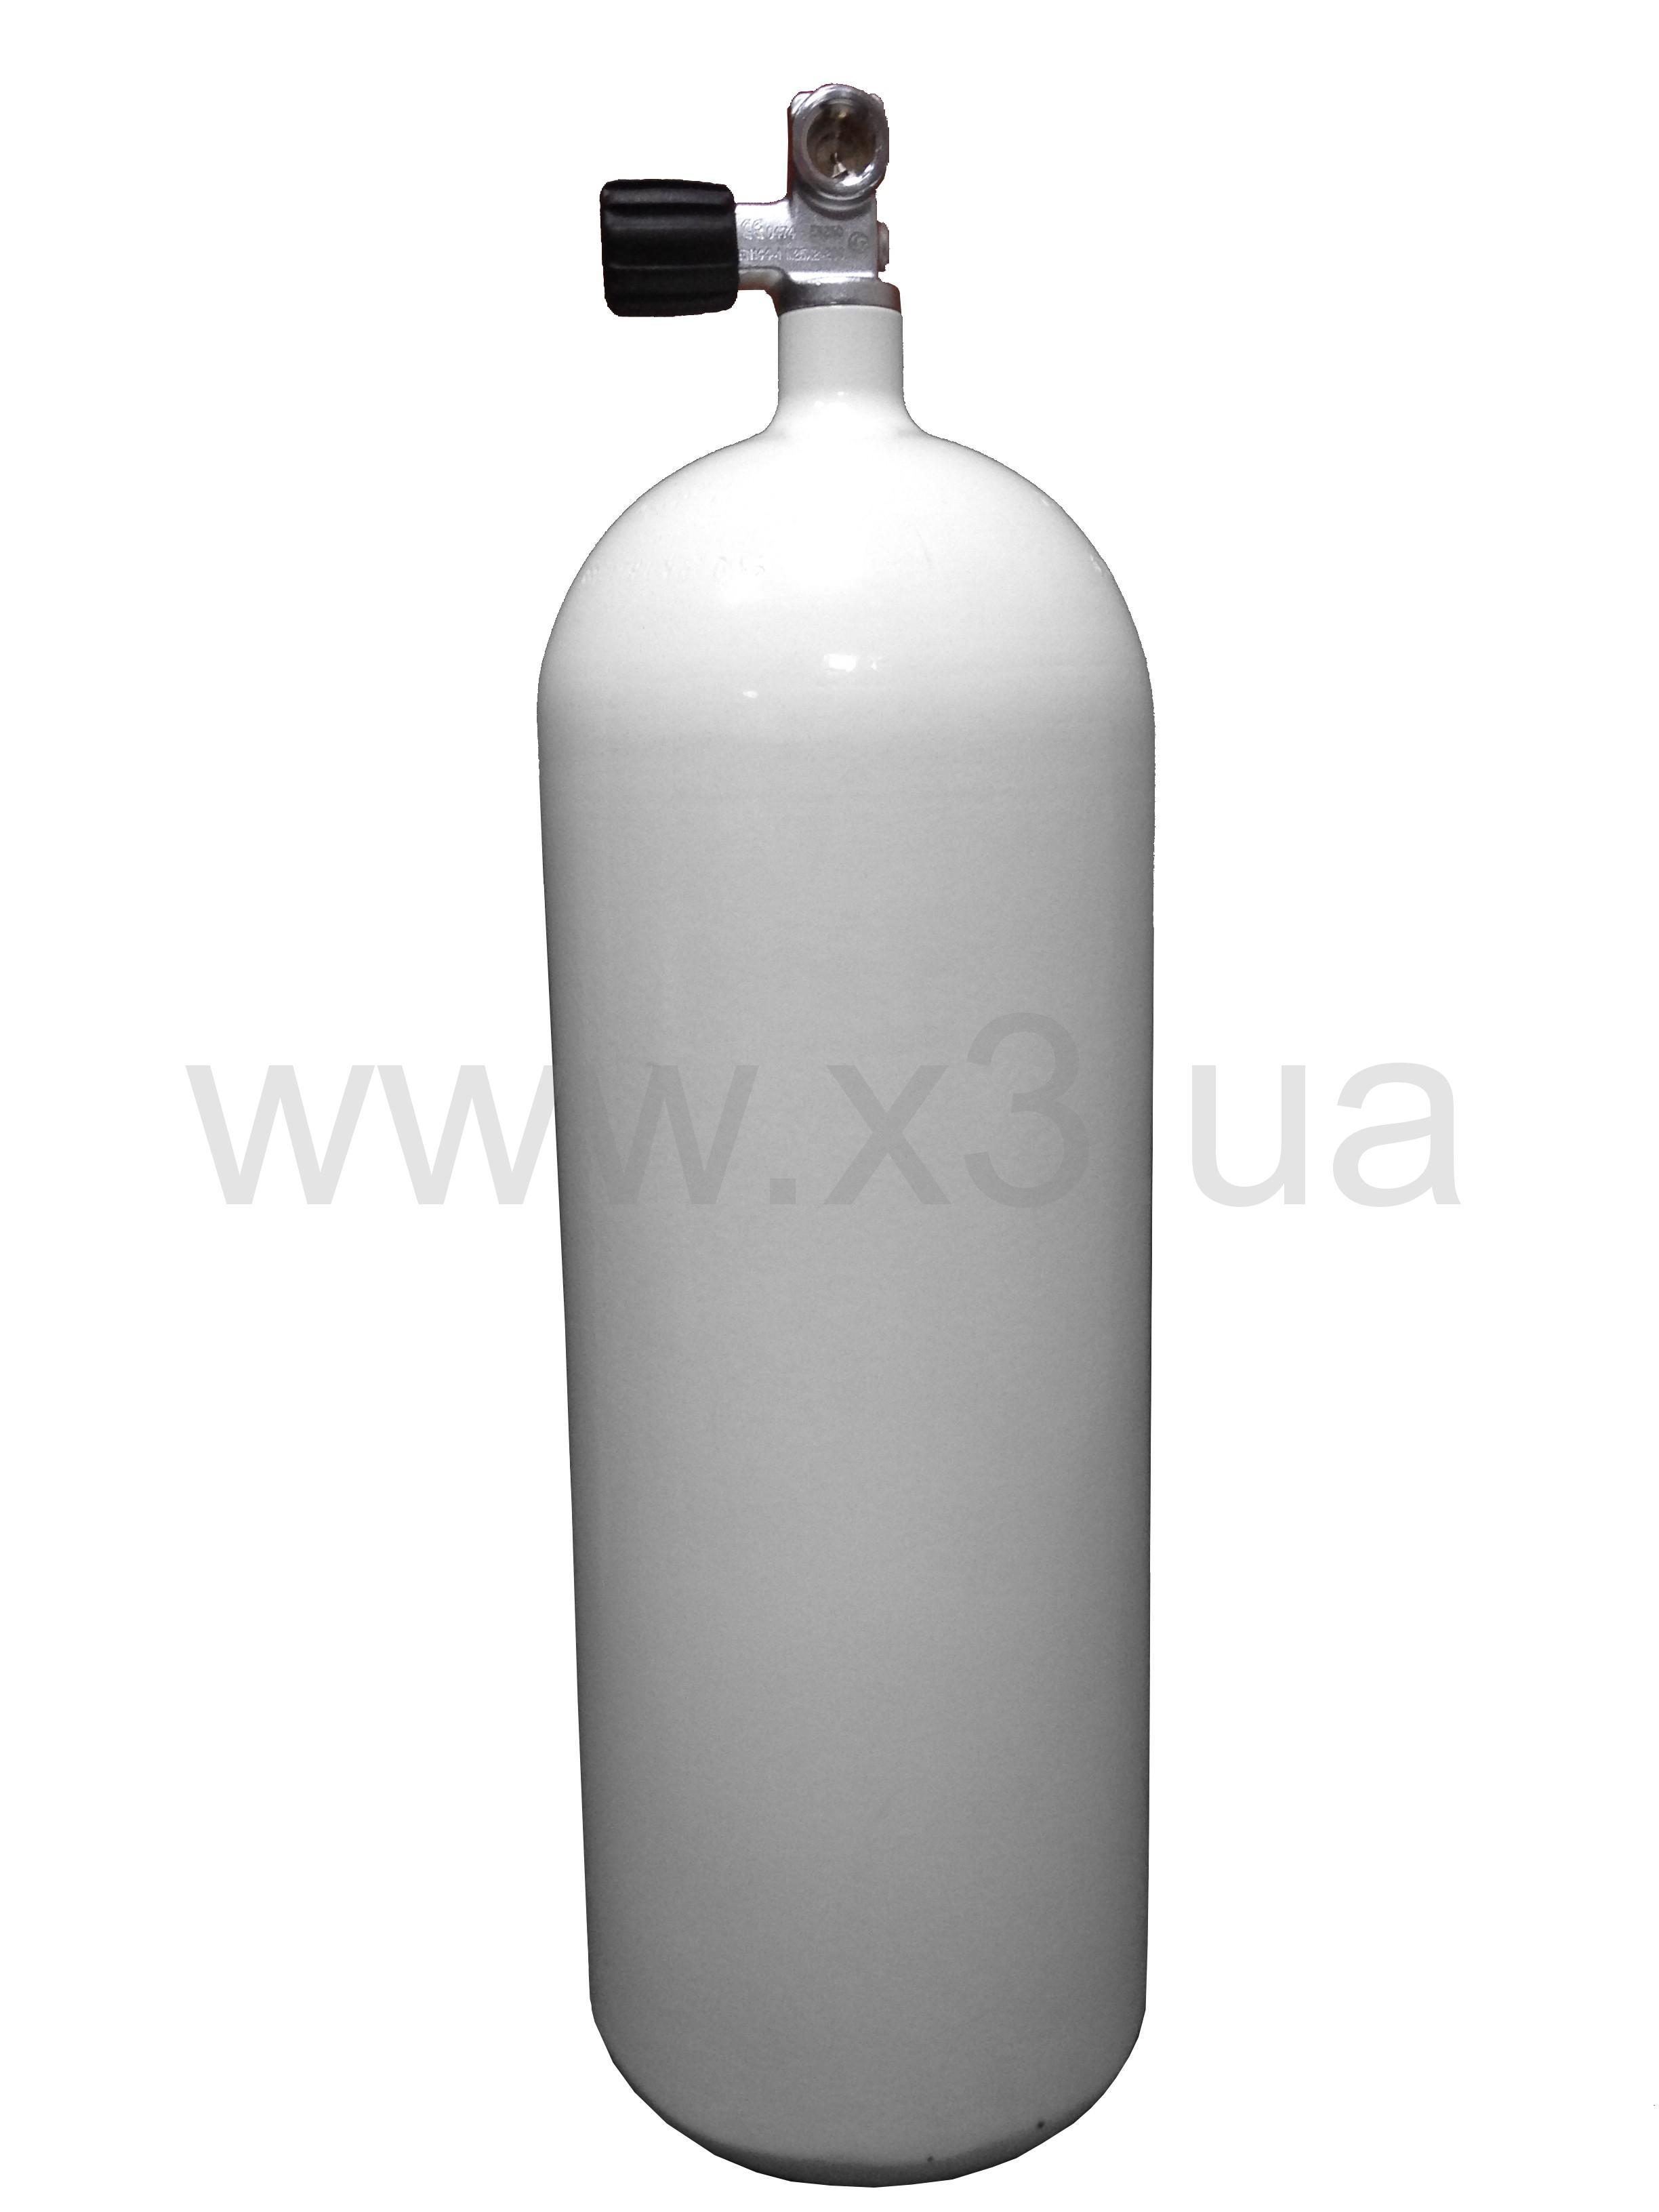 deepzone Баллон (акваланг)DEEPZONE баллон стальной 15 л, 230 Bar, 171 мм с вентилем